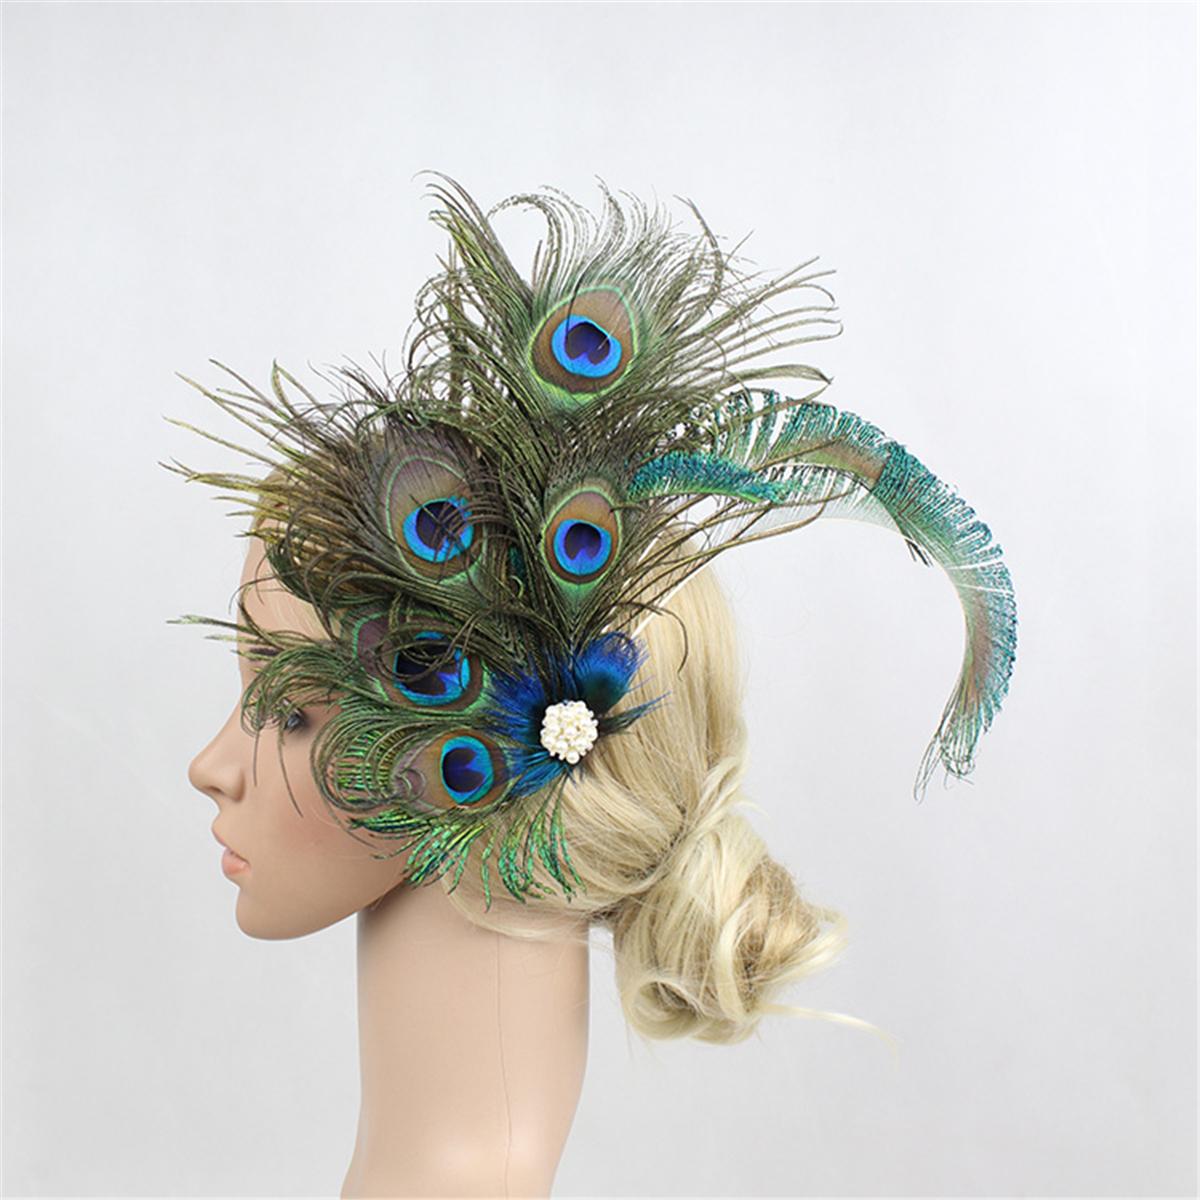 Peacock Headpiece For Wedding: Peacock Headpiece Flapper Costume Headband Headdress